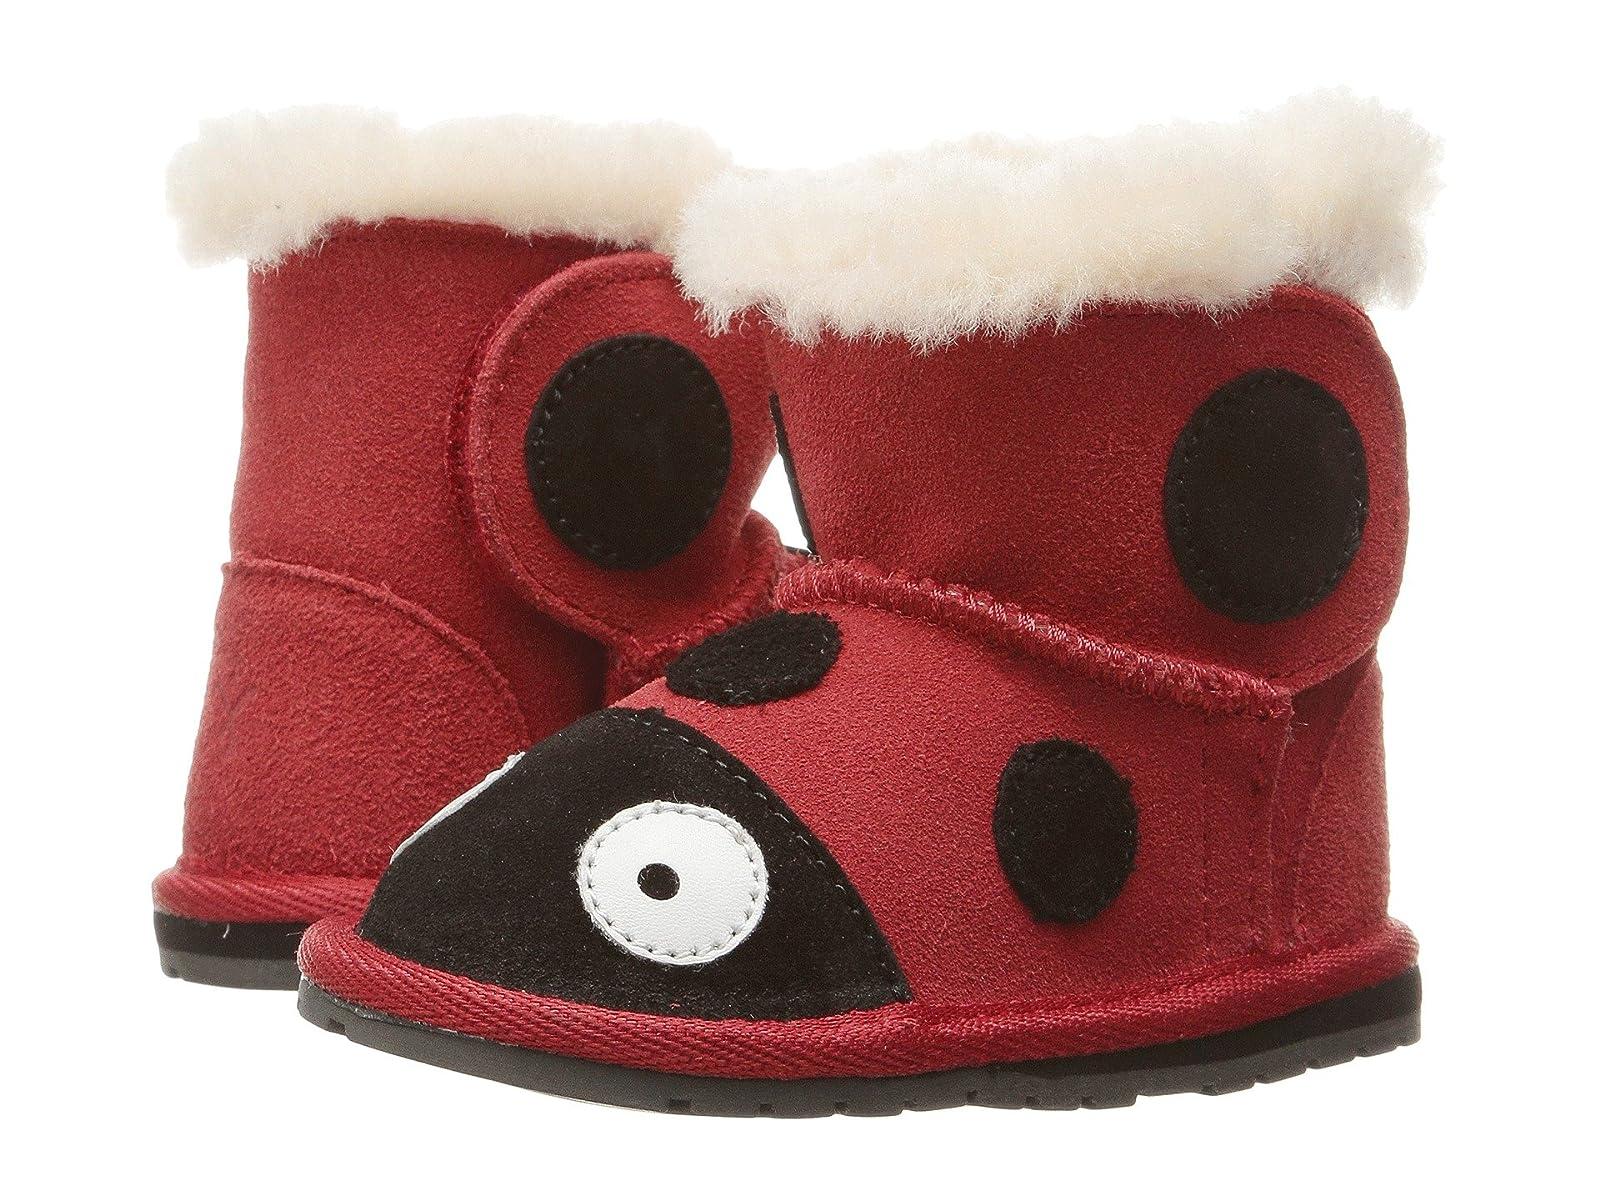 EMU Australia Kids Little Creatures Walkers (Infant)Affordable and distinctive shoes